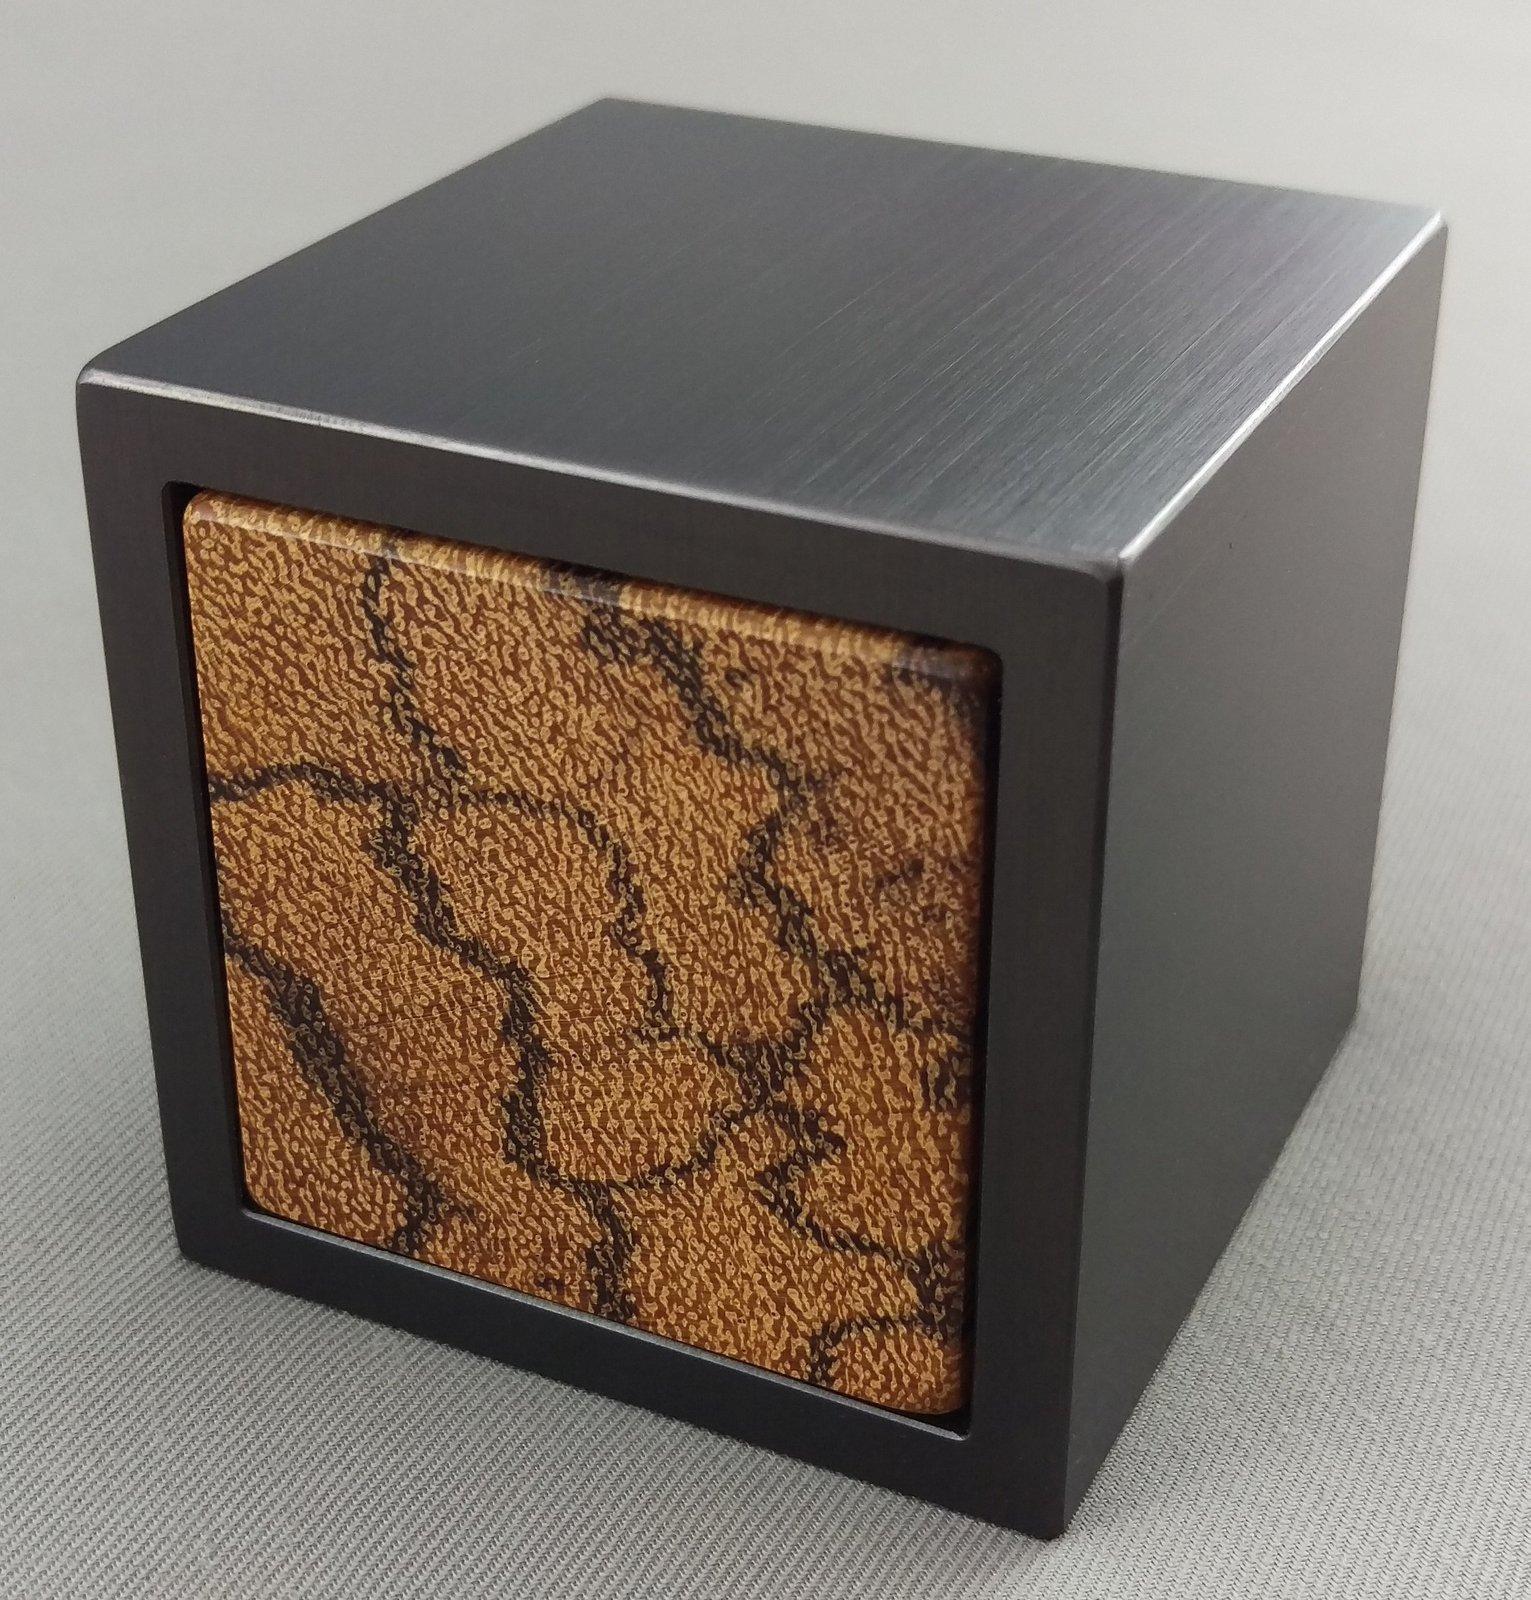 Metal & Wood Cube Engagement Men's Ring Box ,10th Anniversary,Proposal Ring Box